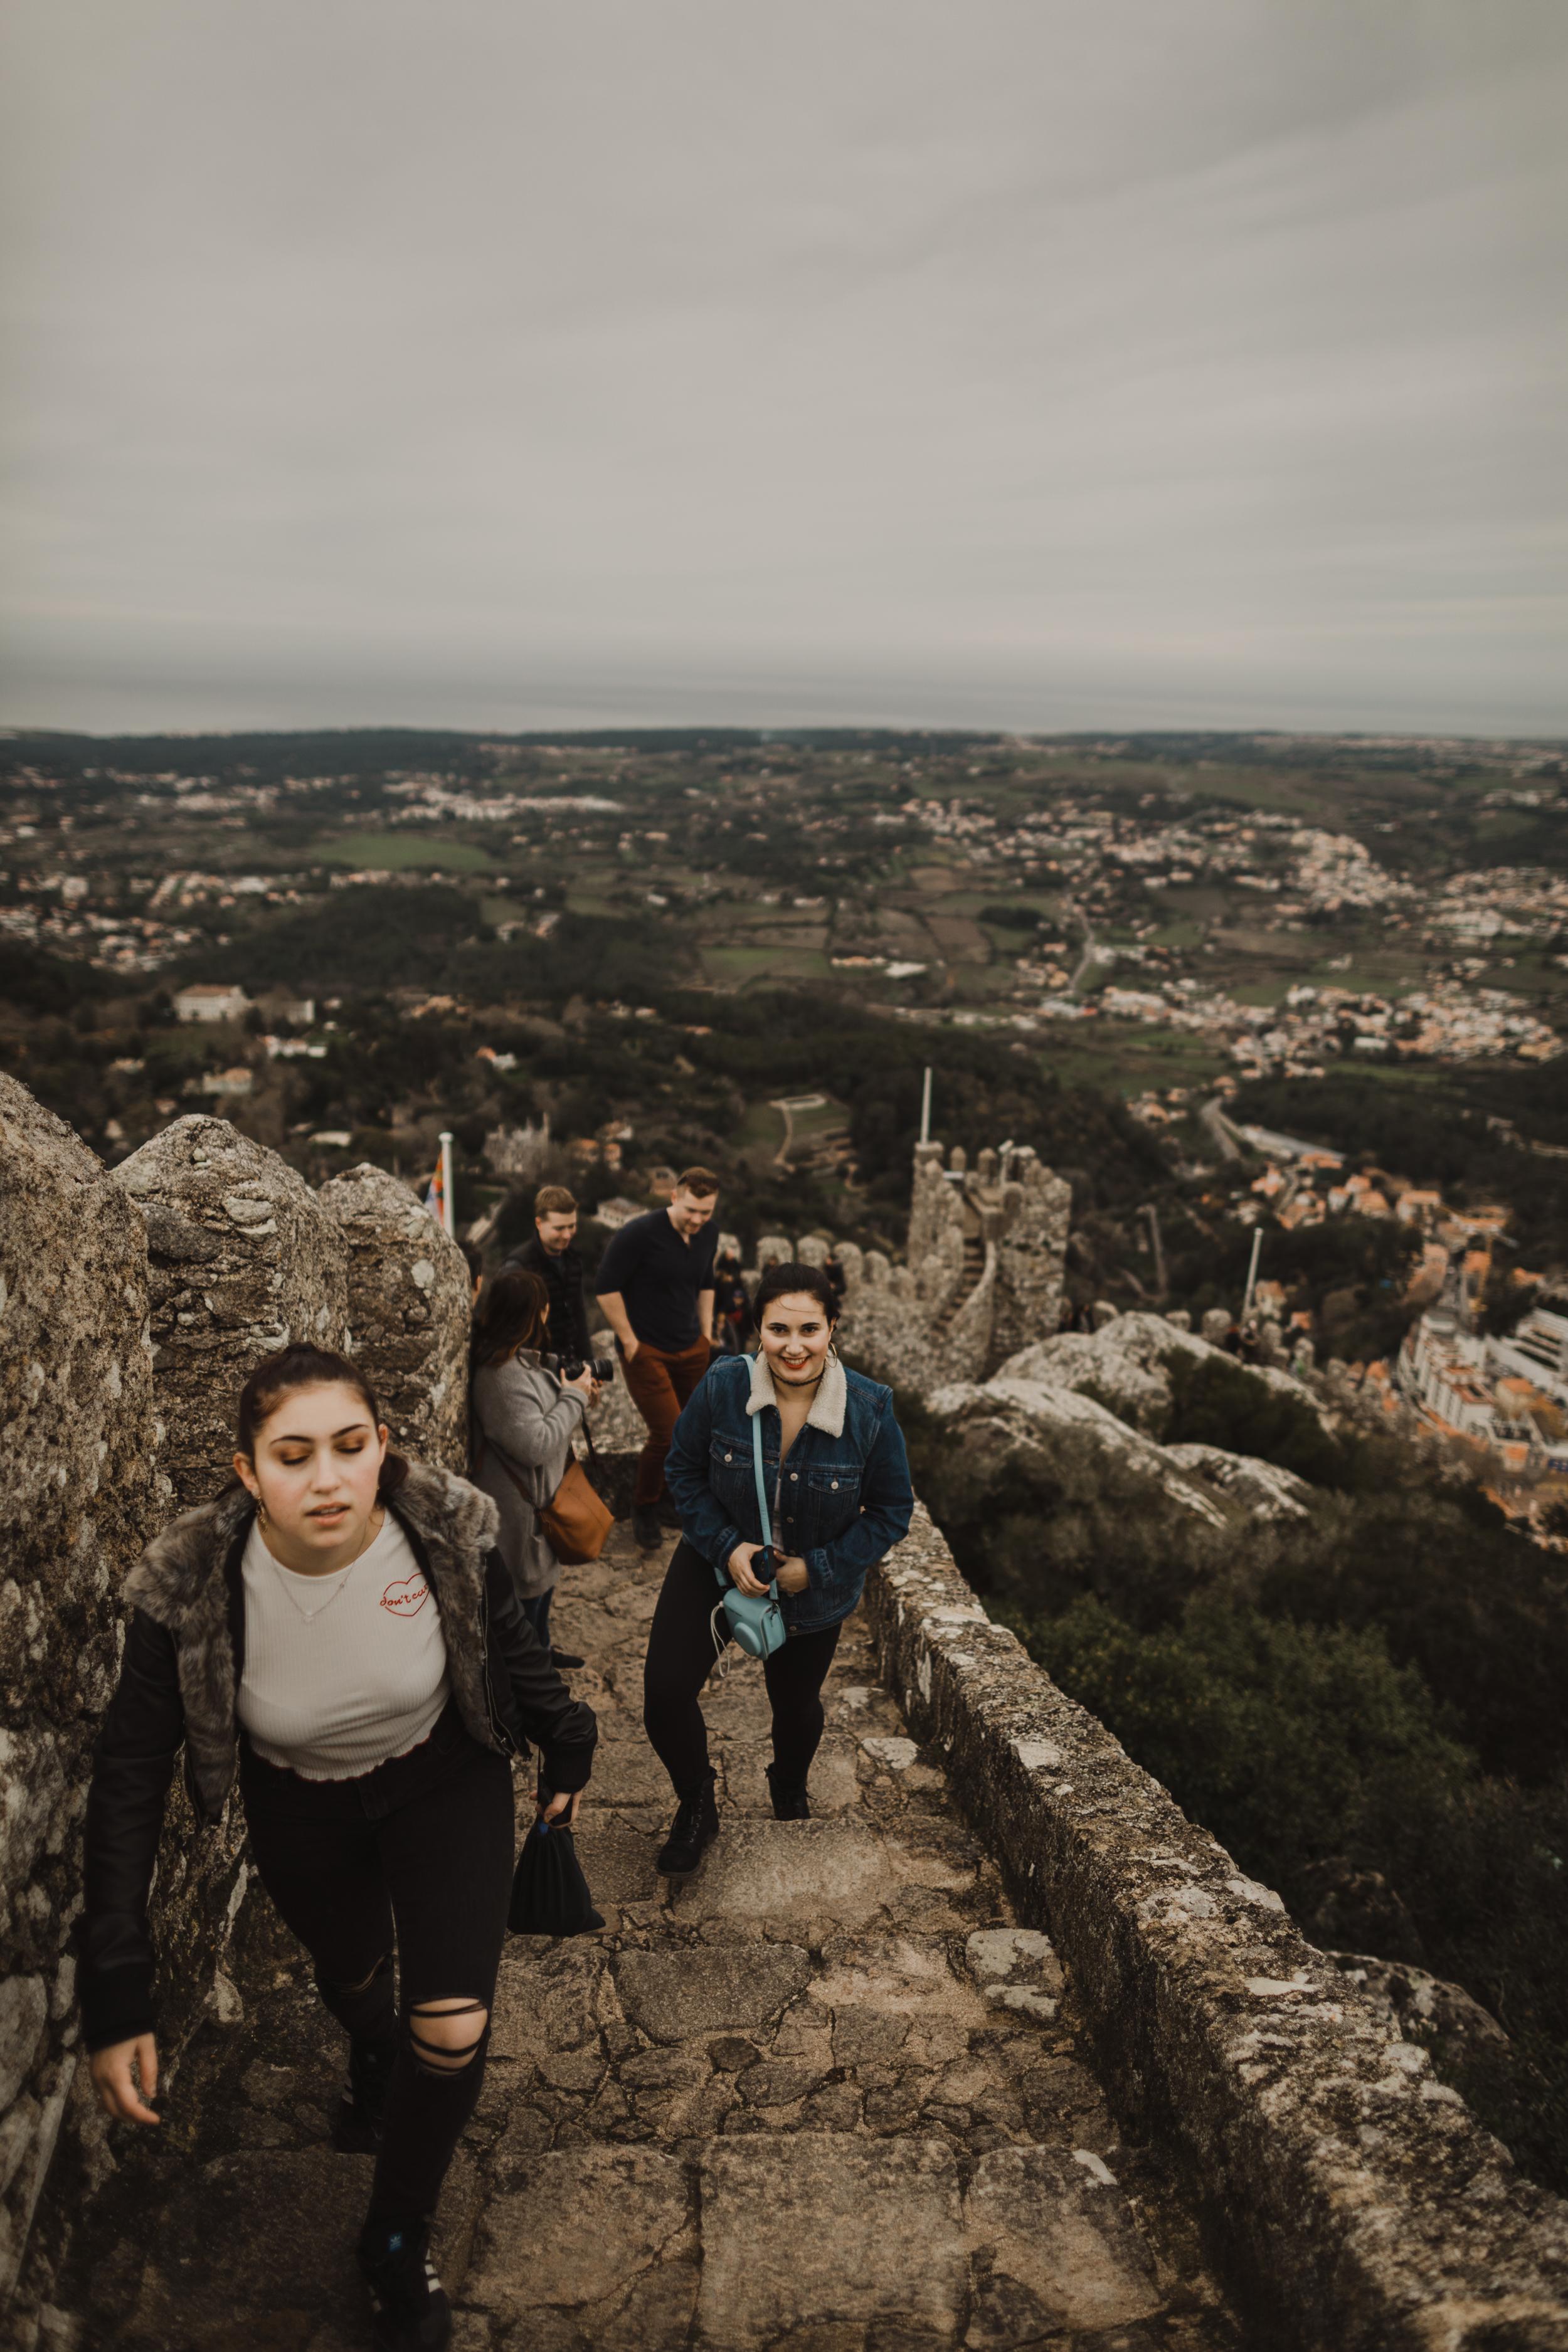 Walking up the rampart of the Moorish Castle